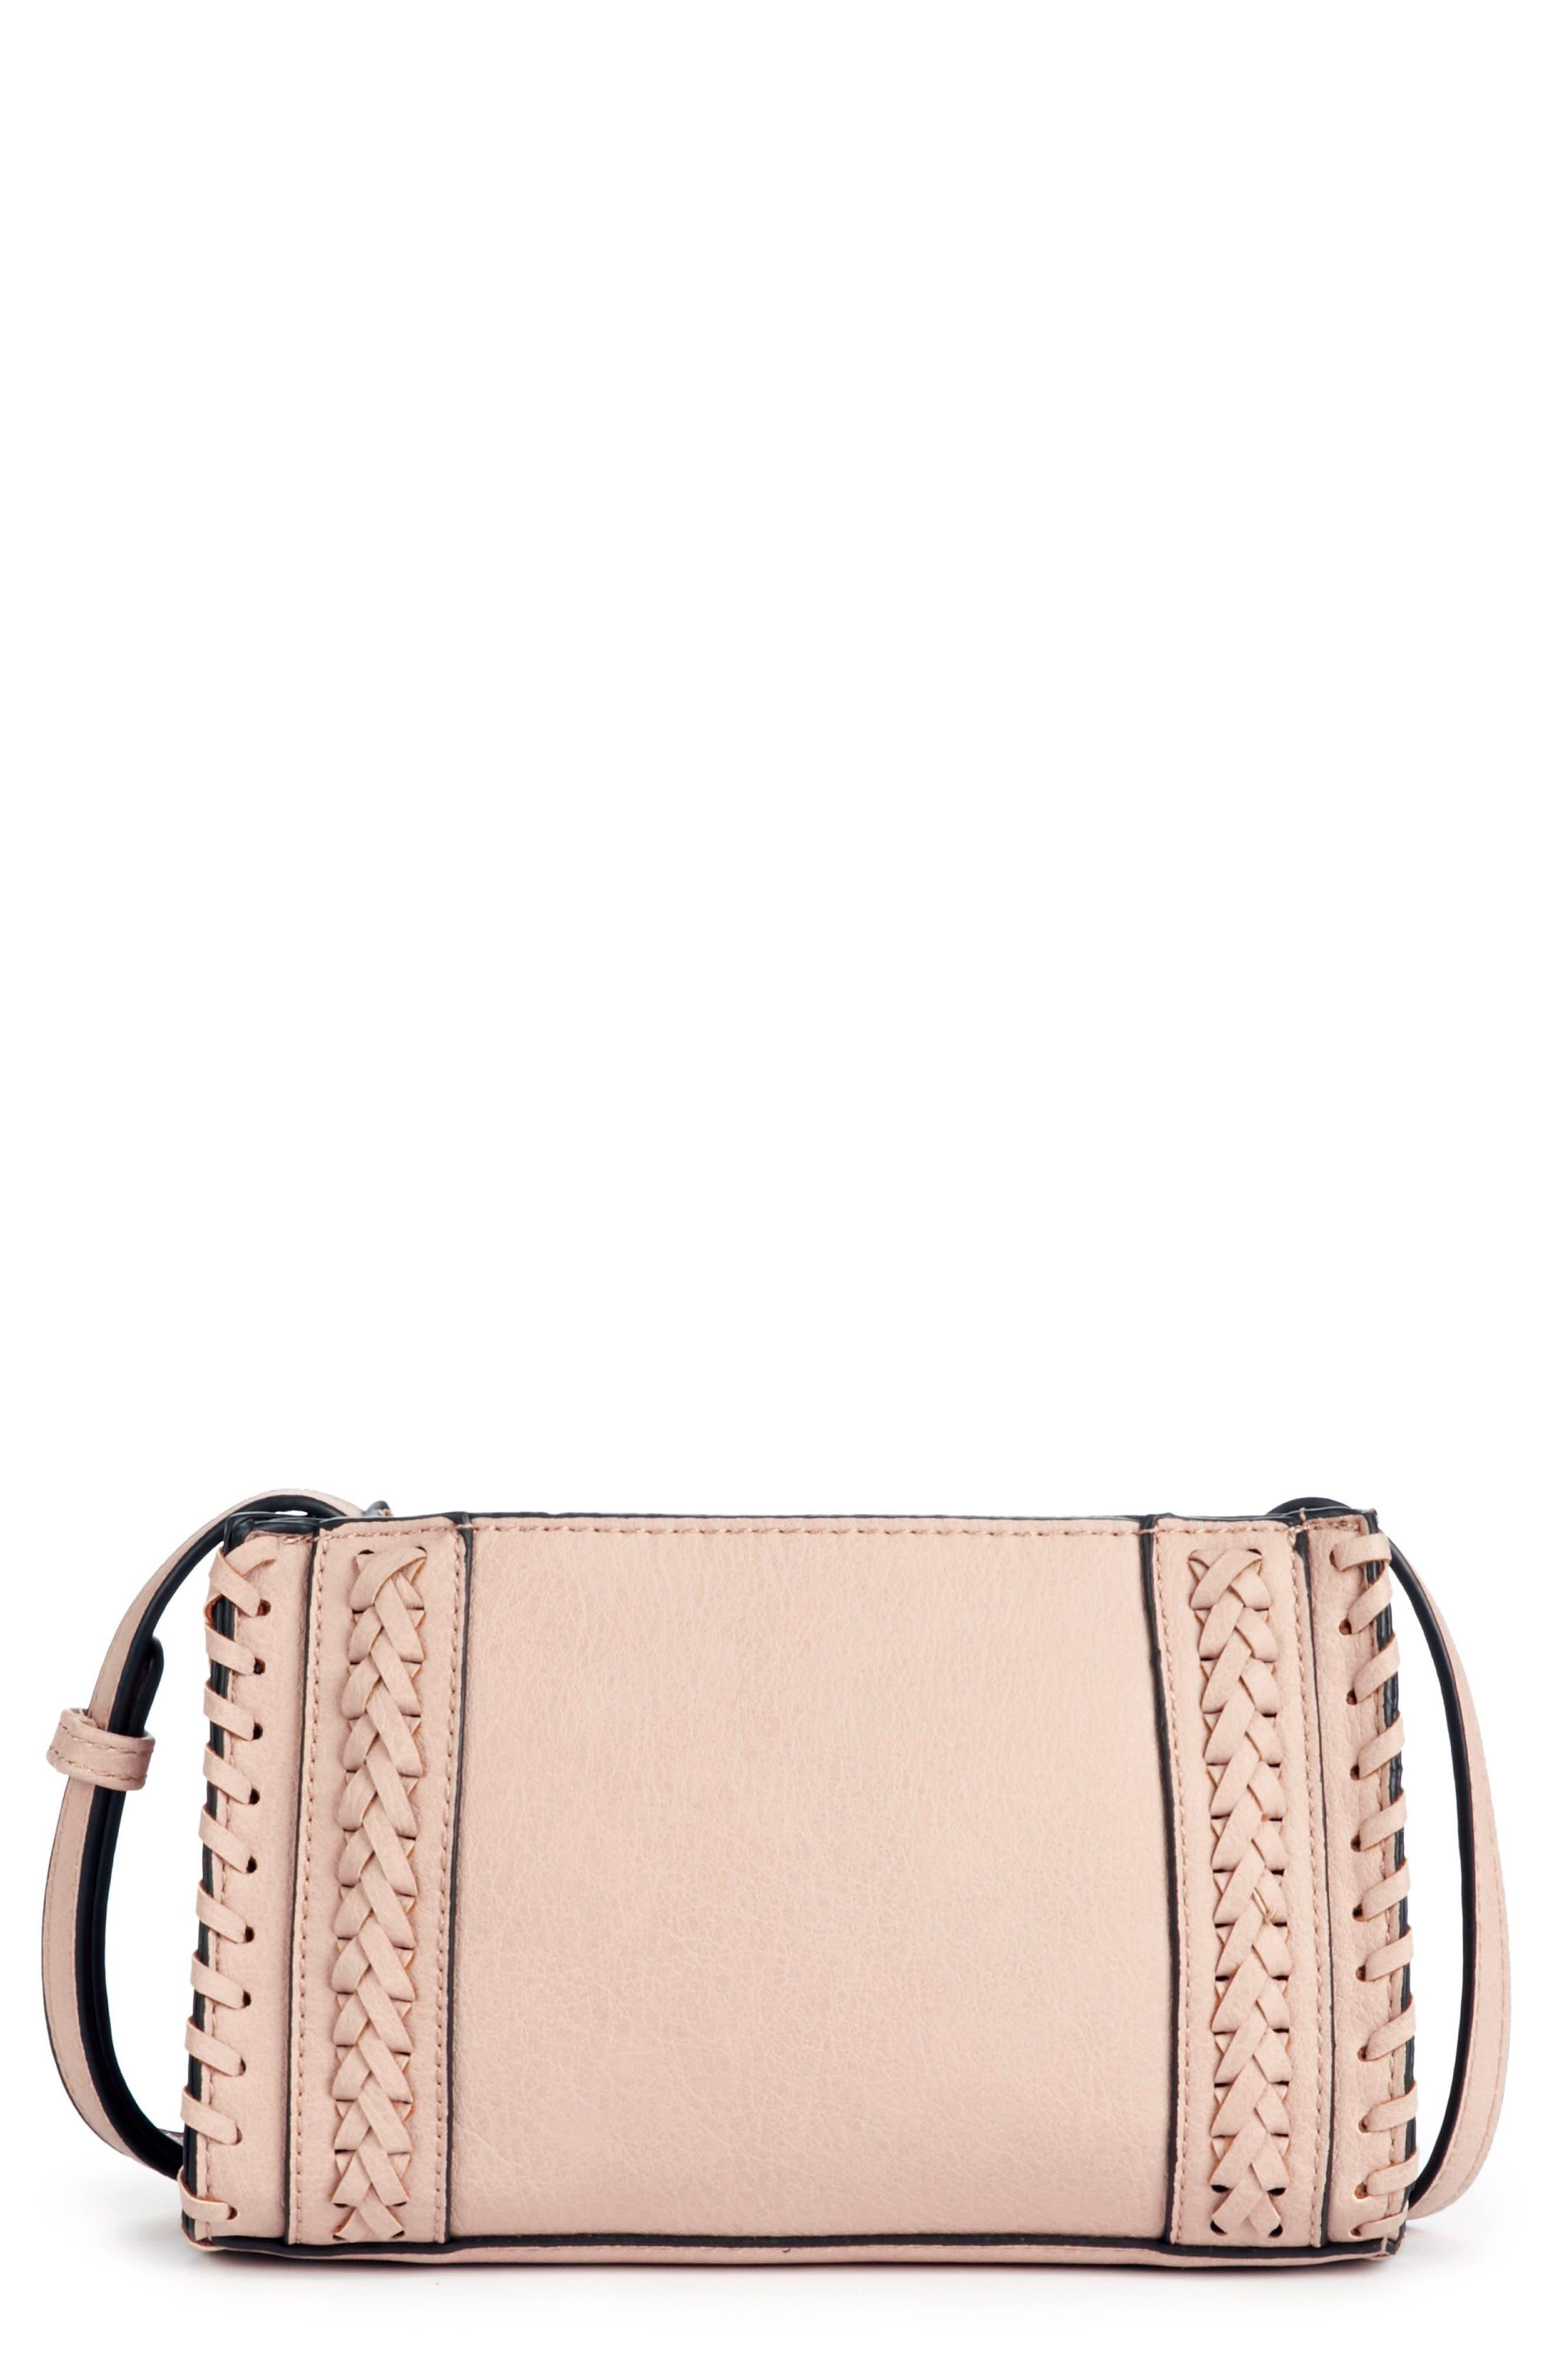 Destin Faux Leather Crossbody Bag,                             Main thumbnail 1, color,                             Blush